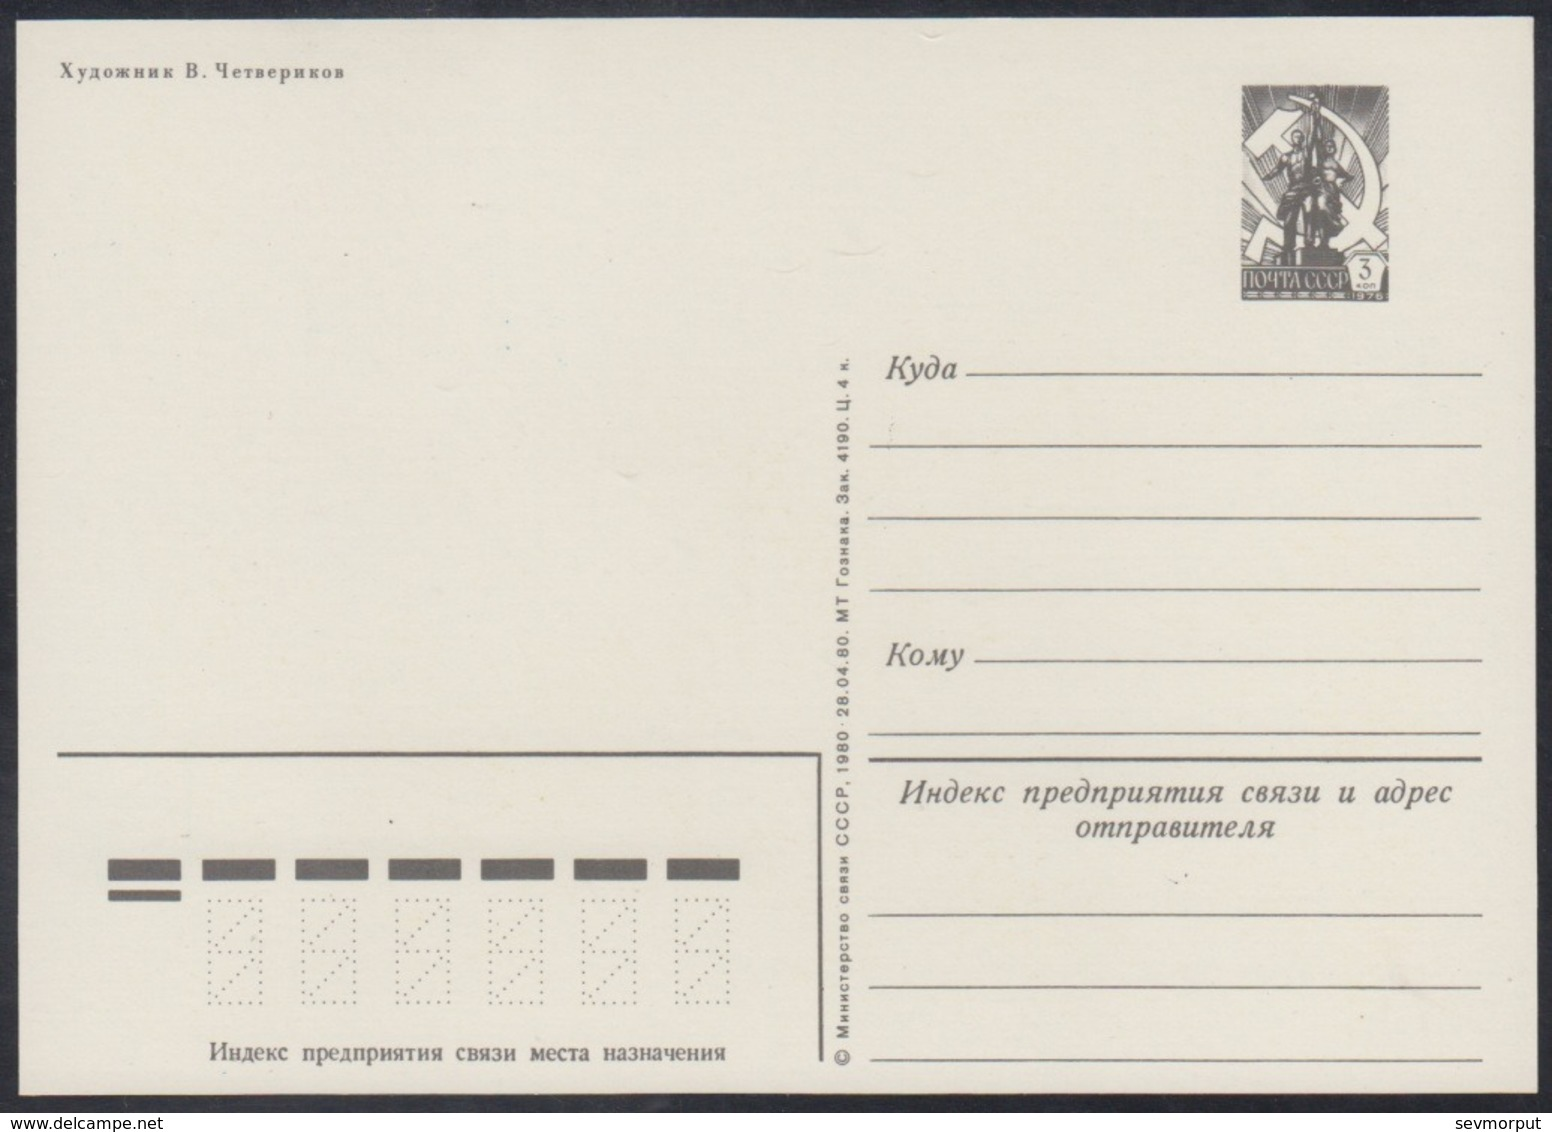 850 RUSSIA 1980 ENTIER POSTCARD L 4190 Mint MARCH 8 WOMAN DAY MOTHER Celebration FAIRY TALE CONTE FEE MARCHE PINOCCHIO - Muttertag